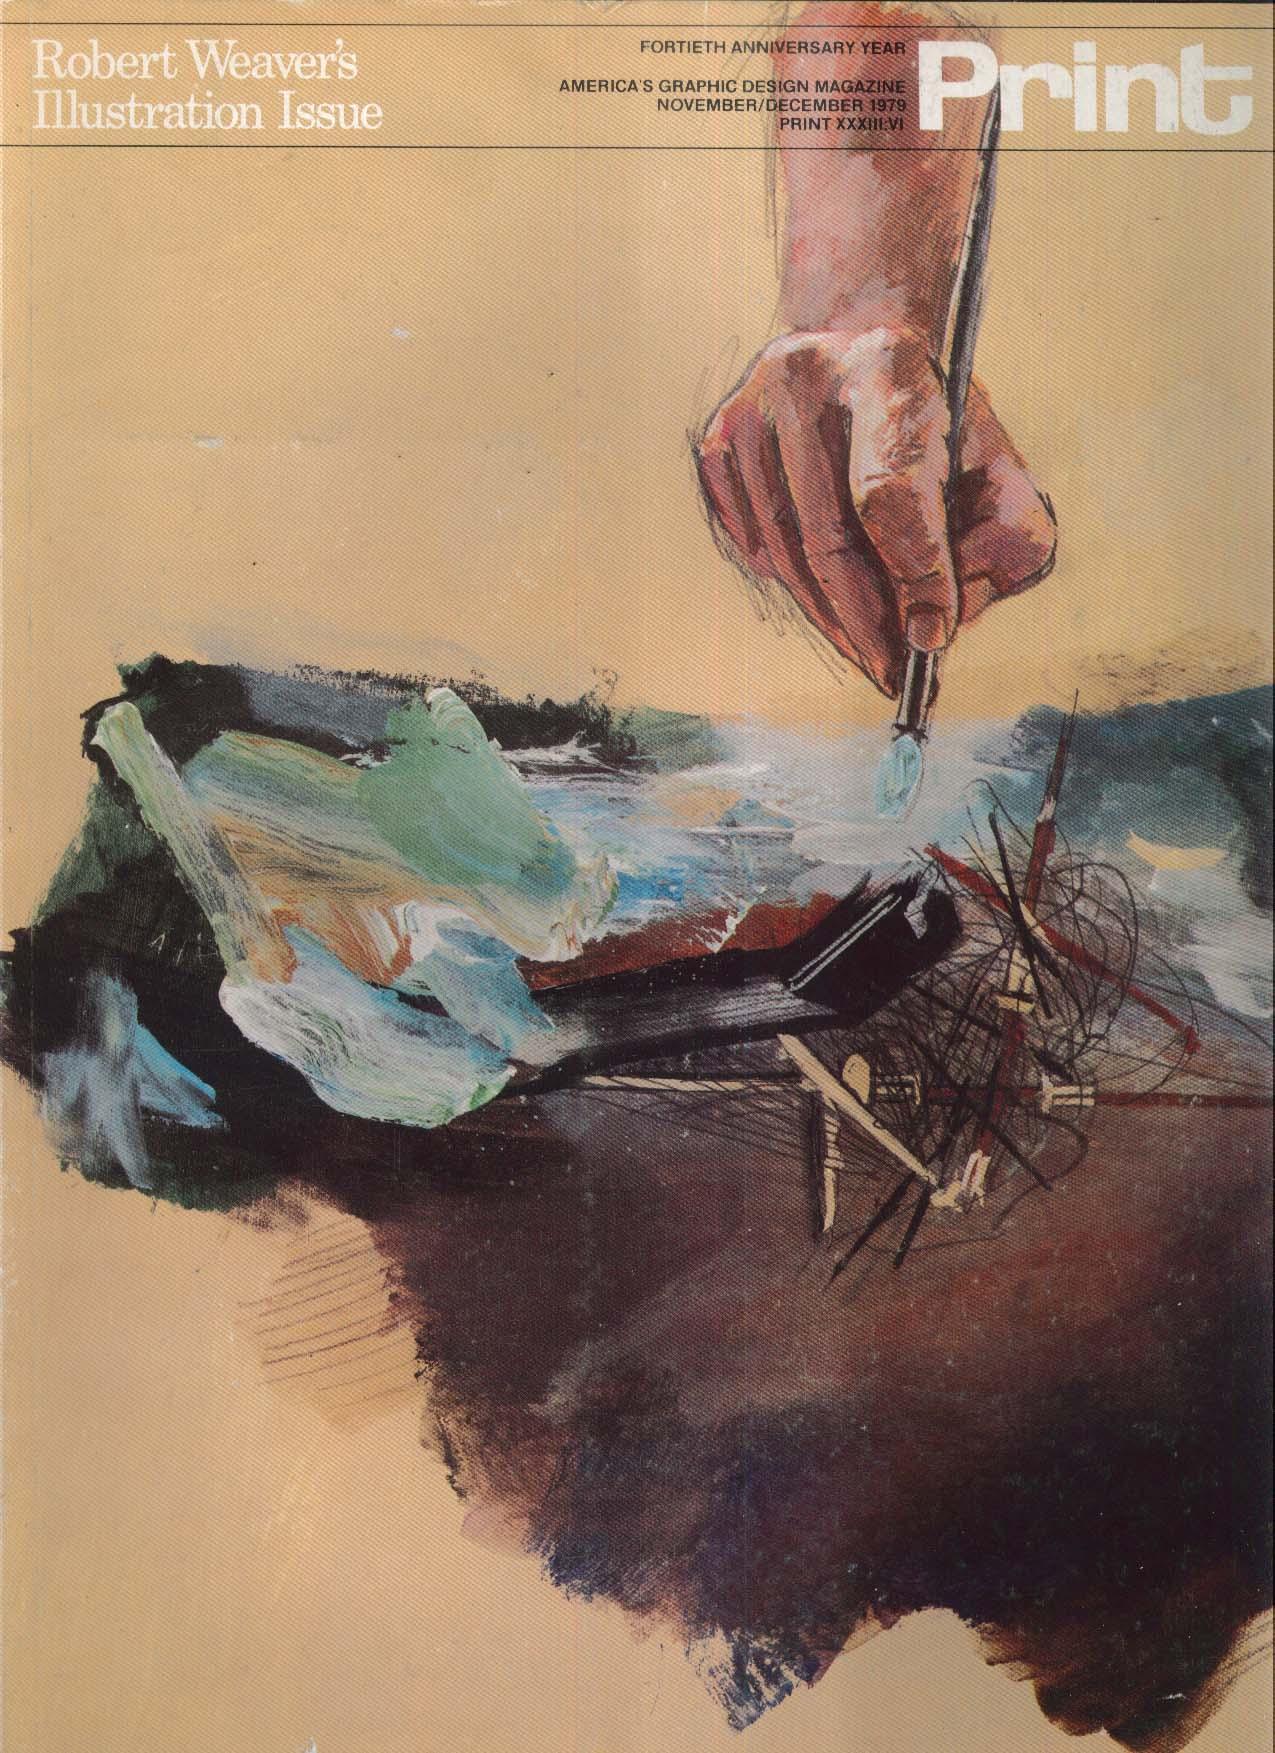 PRINT Robert Weaver Ralph Steadman Milton Glaser ++ 11-12 1979